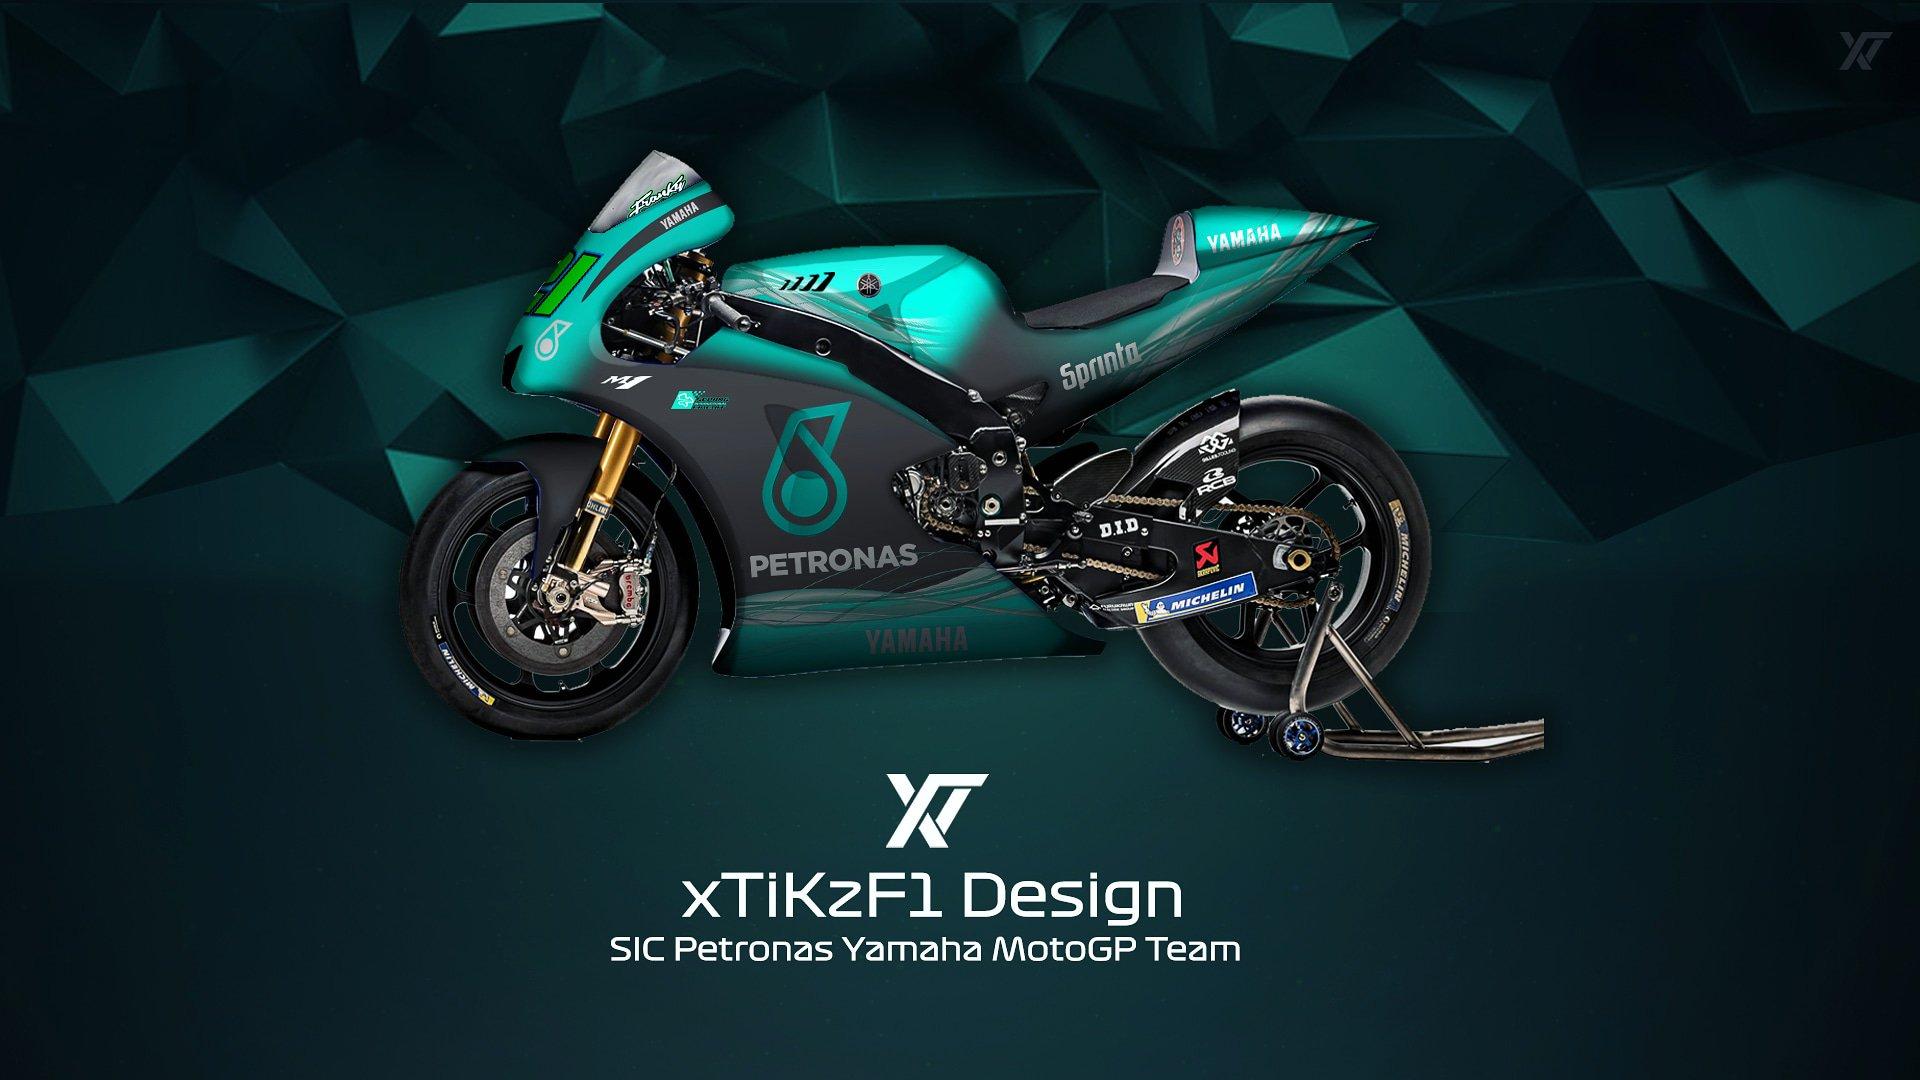 Xtikzf1 On Twitter Sic Petronas Yamaha Motogp Team Concept Yamaharacingcom Sicracingteam Sepangcircuit Petronas Fabioq20 Frankymorbido12 By Xtikzf1 Motogp 2019 Sicpetronas Sic Fm21 Fq20 Yamaha Yzr M1 Https T Co 4ivwy21txf